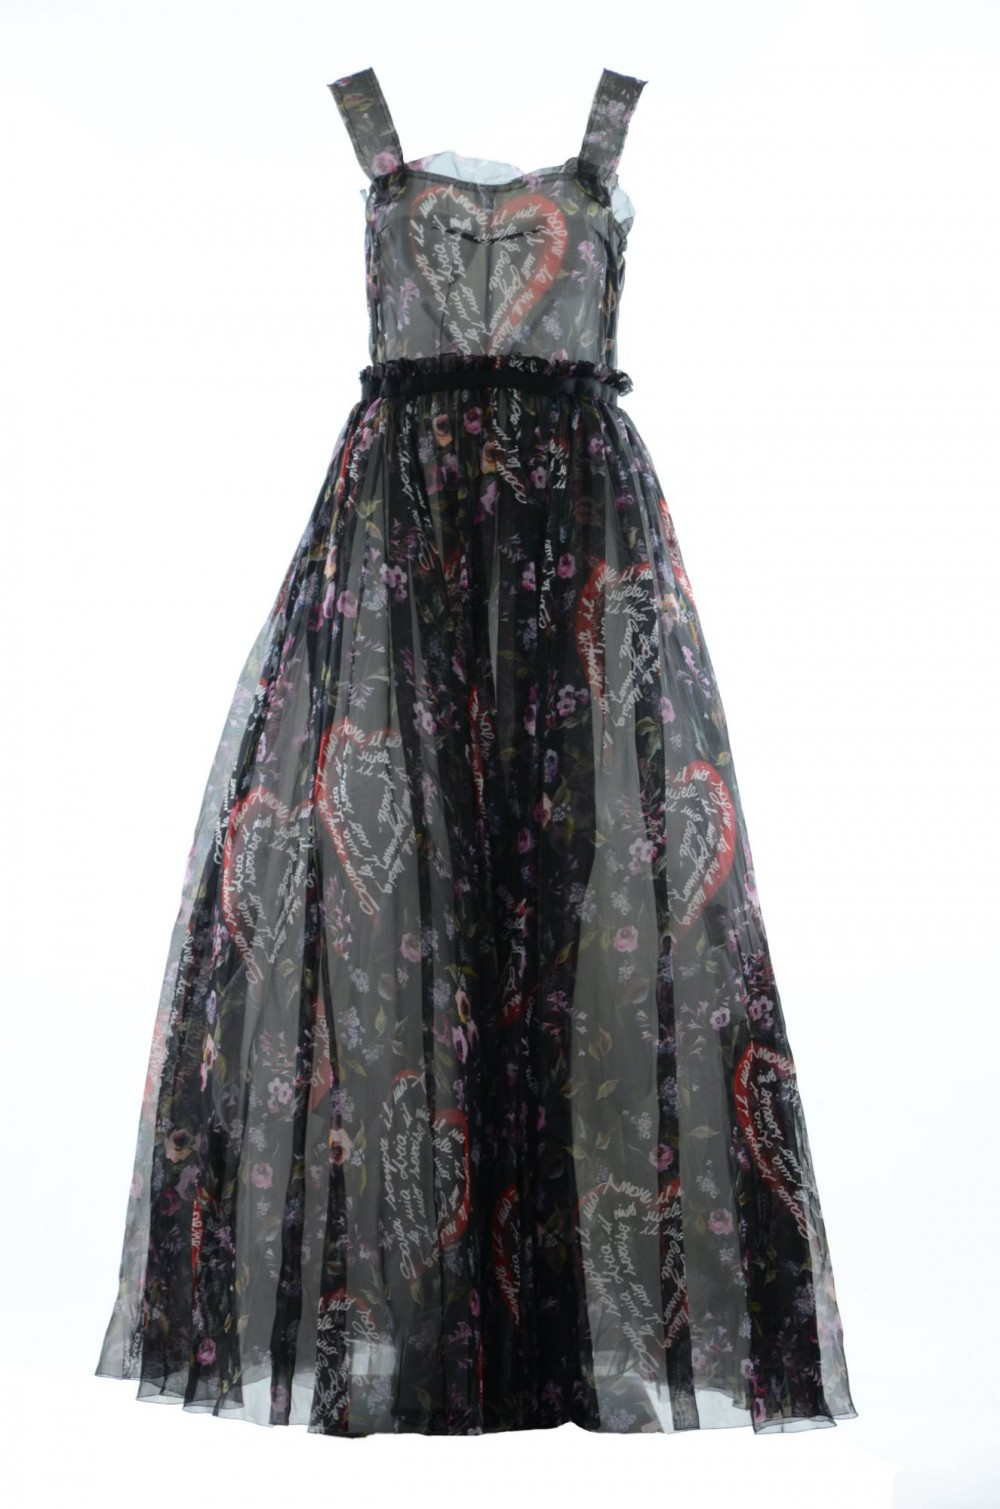 dolce and gabbana dress,dolce and gabbana dress,dolce and gabbana dress,